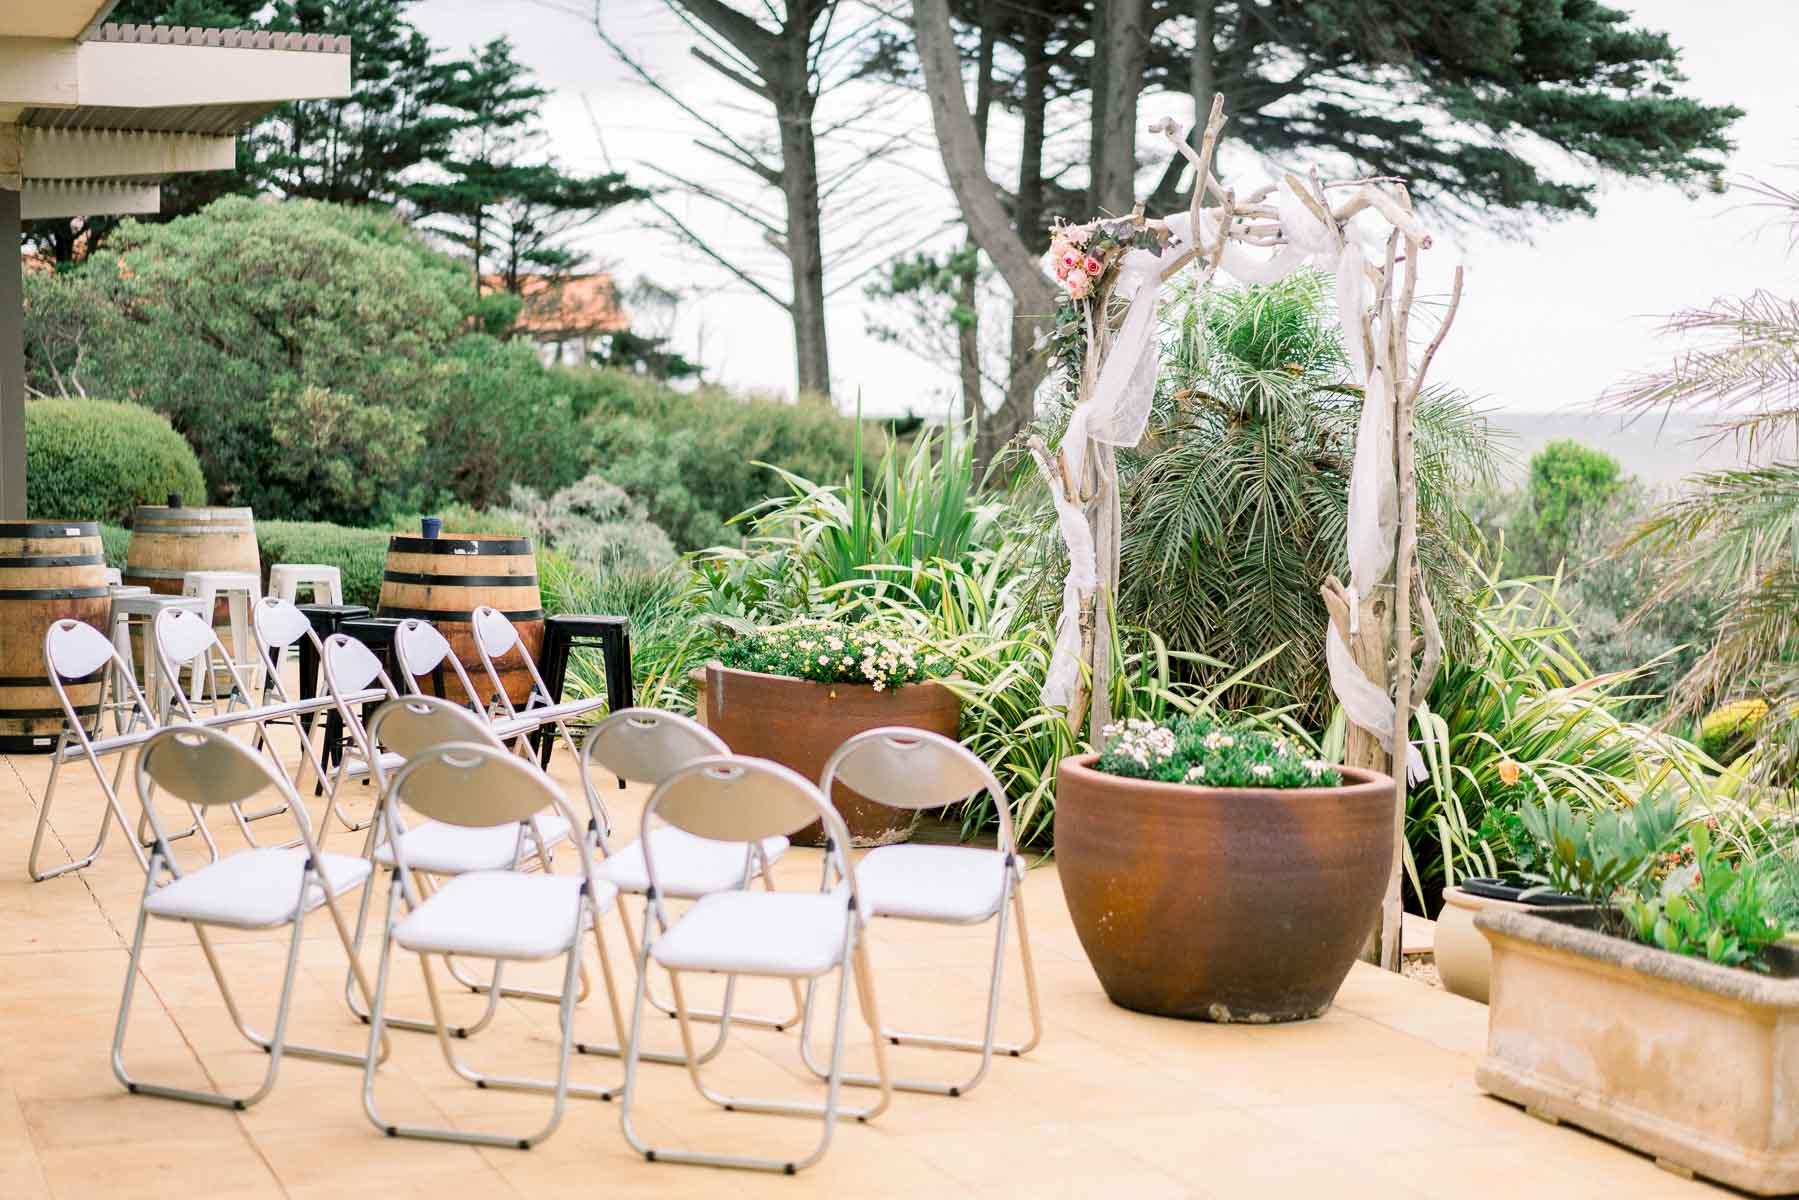 mt-eliza-mornington-peninsula-backyard-wedding-heart+soul-weddings-allison-matt-02954.jpg